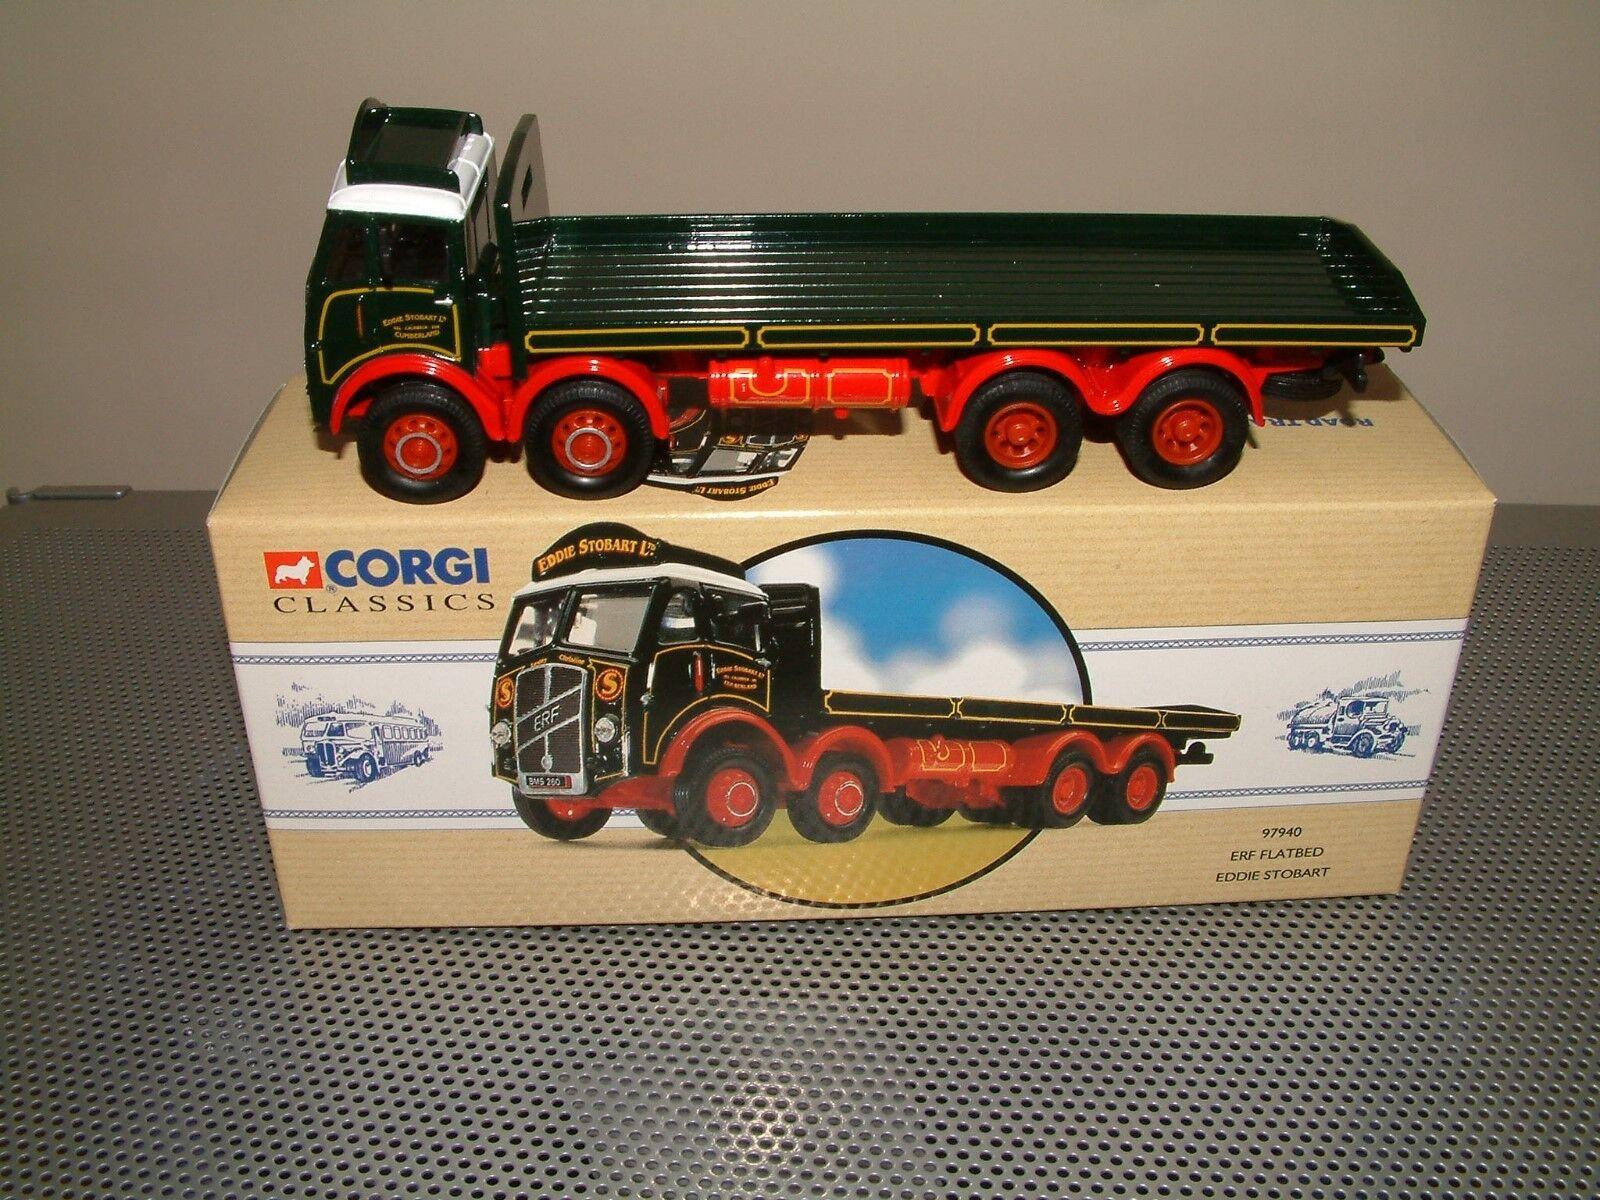 CORGI 97940 ERF Flatbed Eddie Stobart